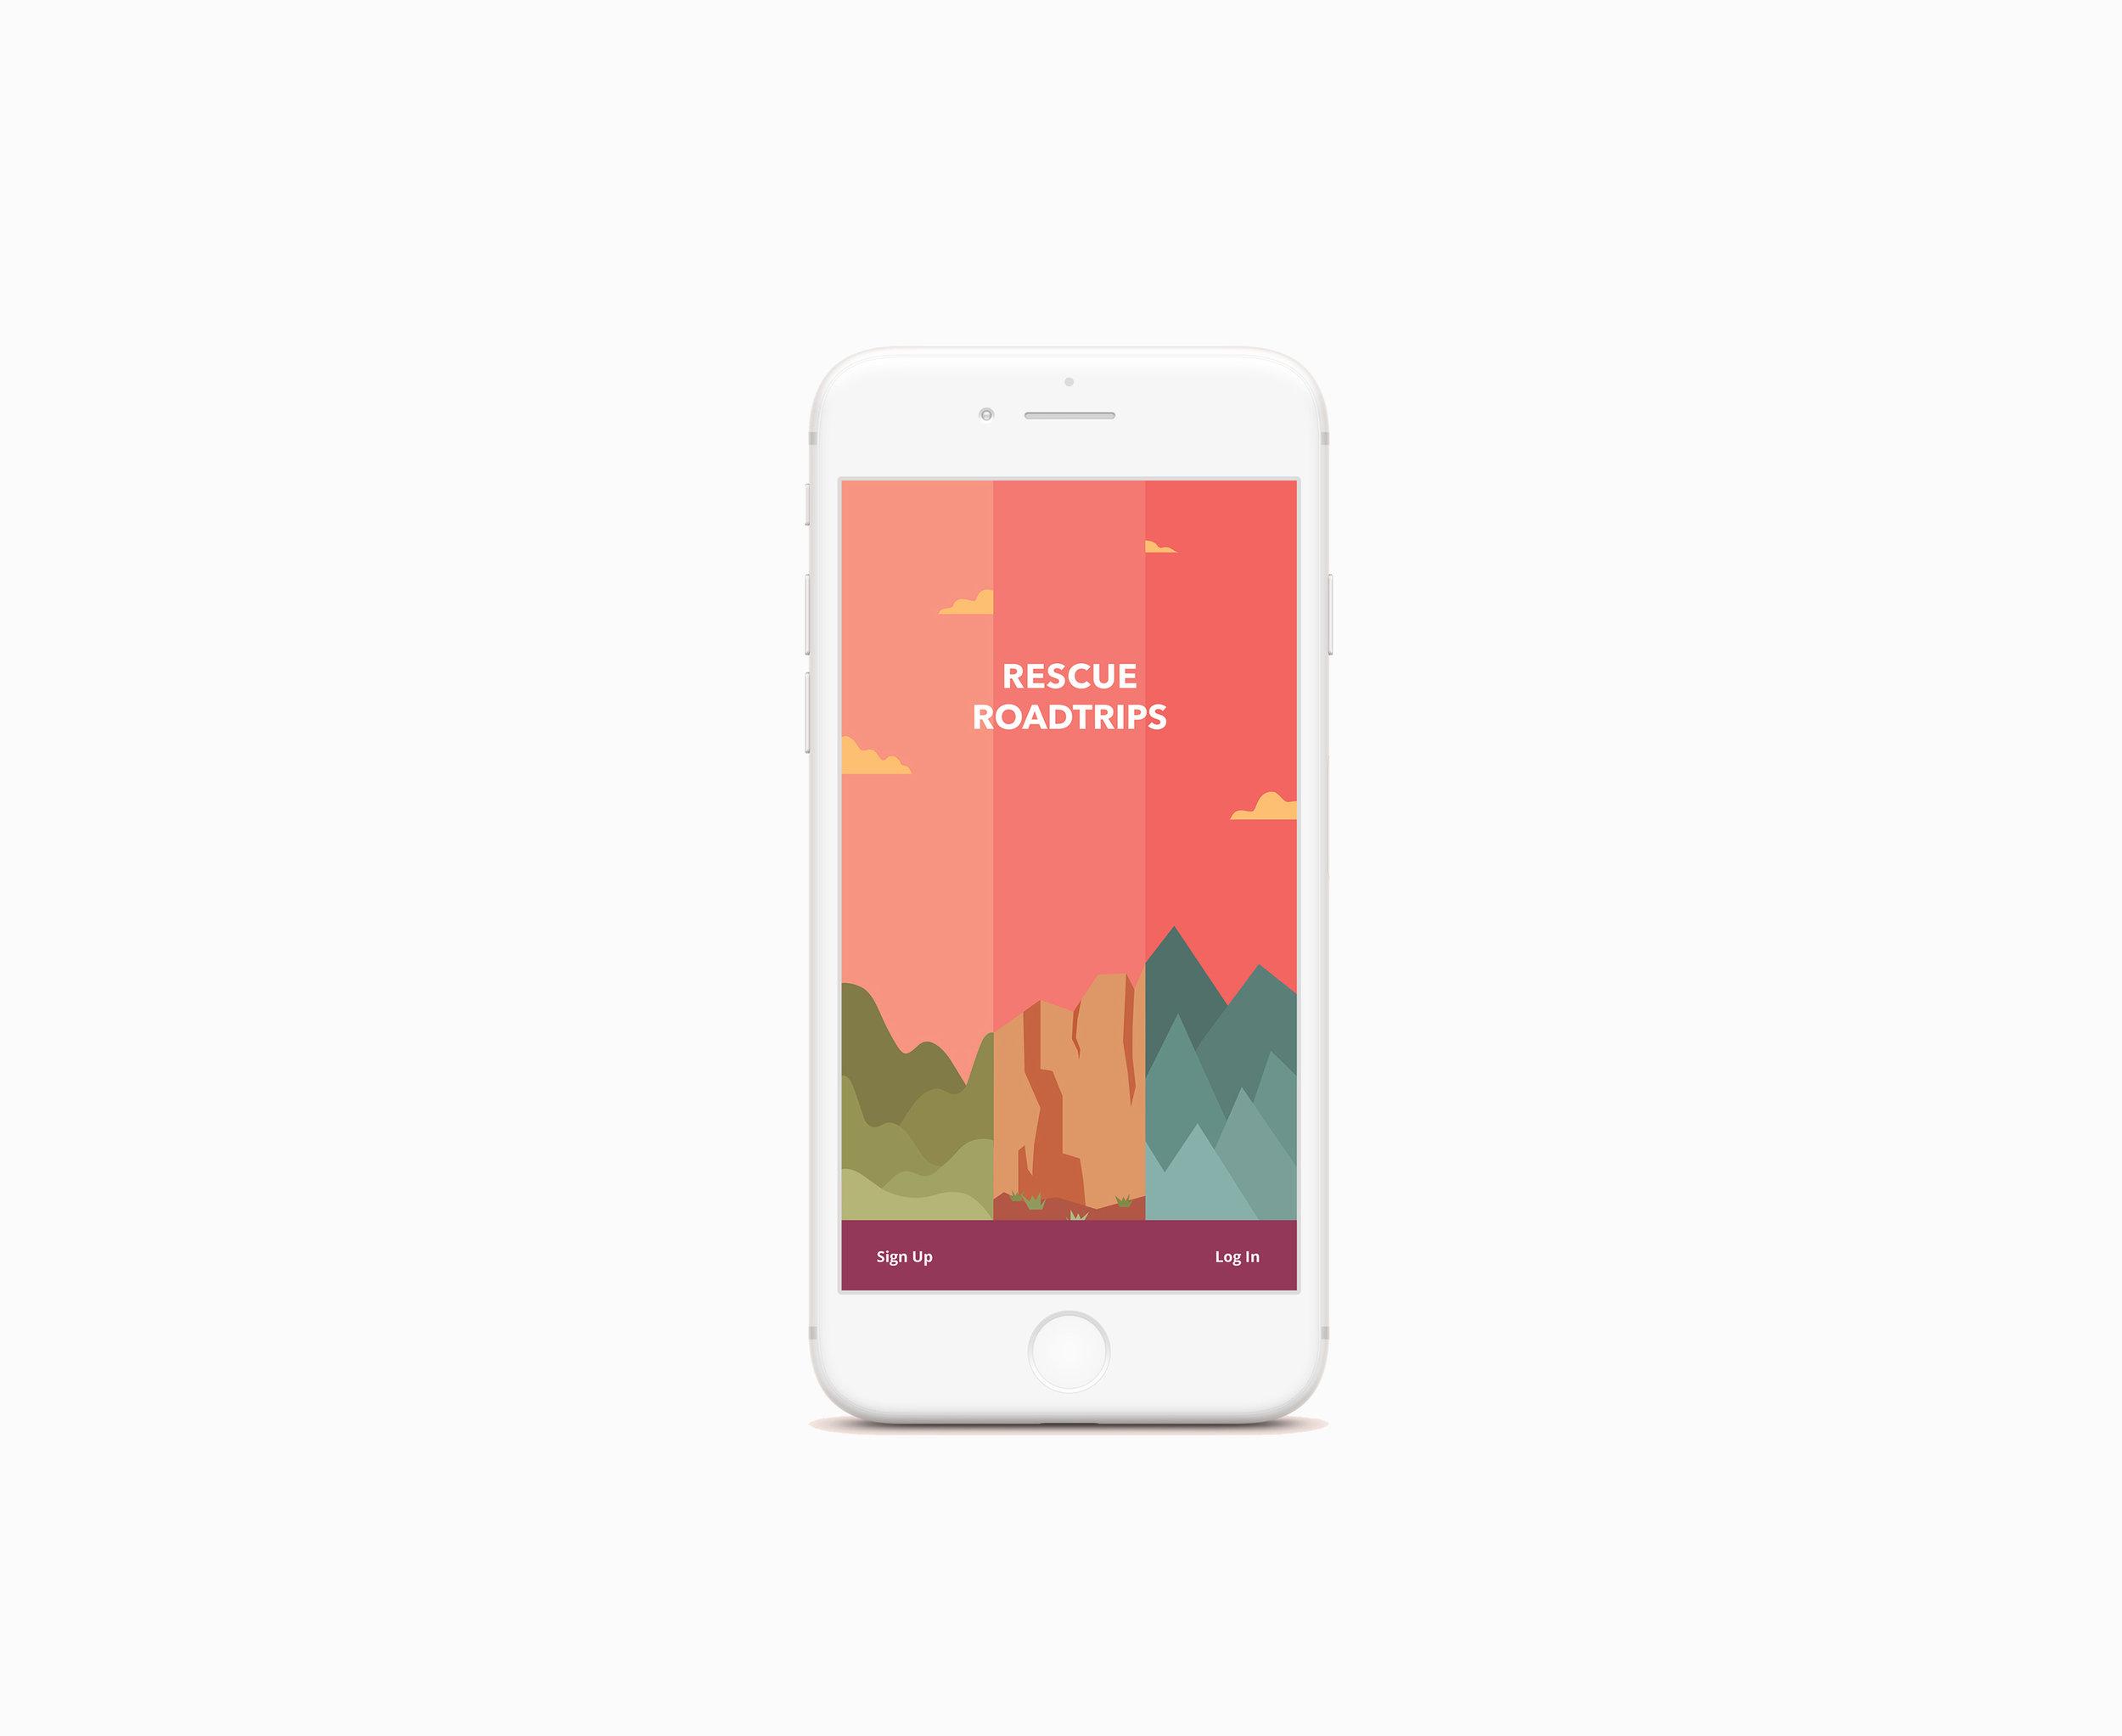 01_feature(horizontal).jpg